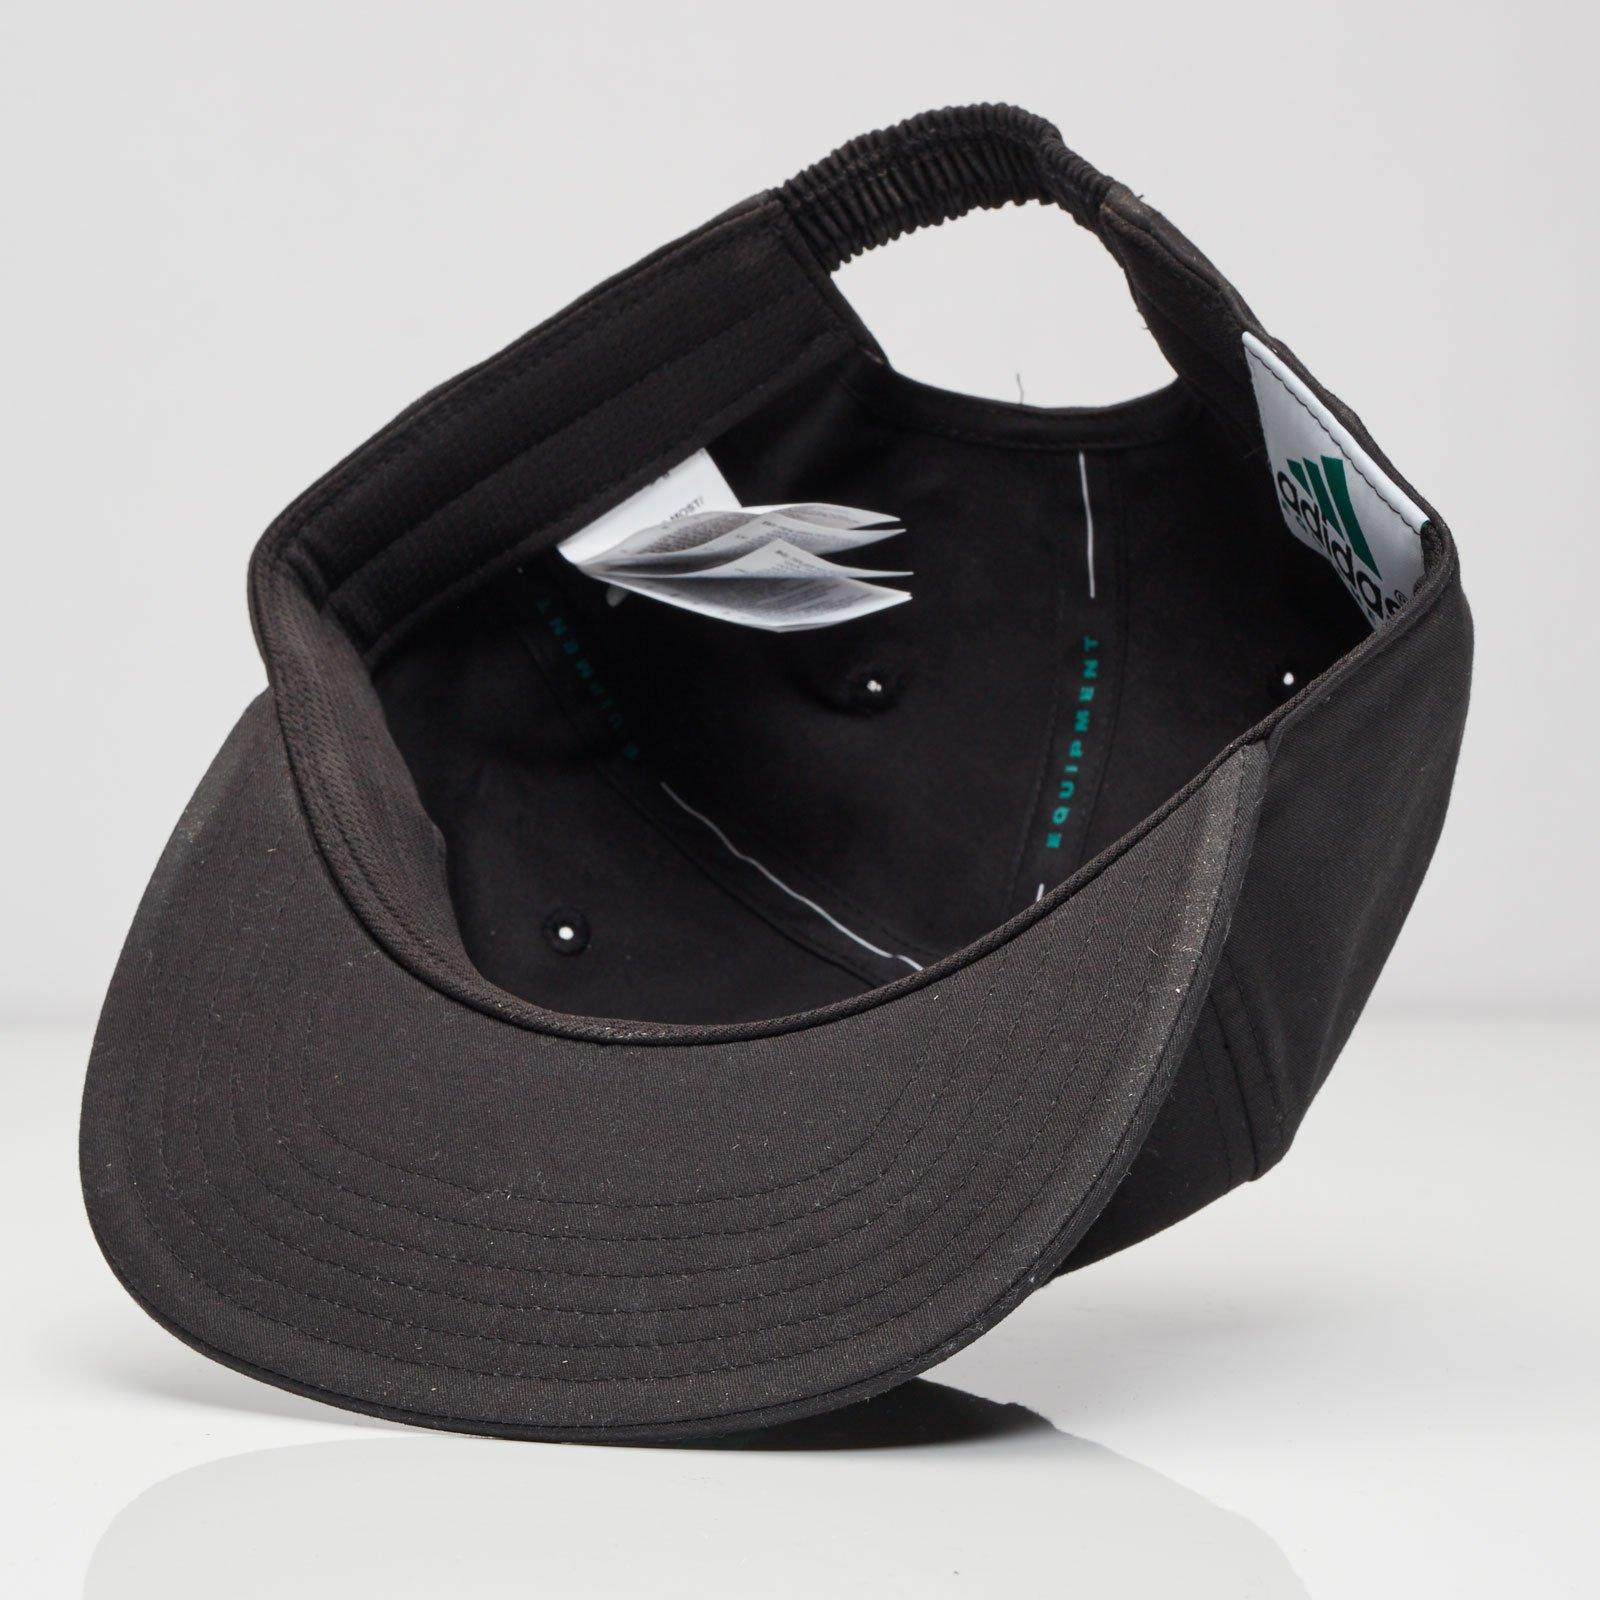 9d56984a adidas Re Eqt Cap - Ay9420 - Sneakersnstuff | sneakers & streetwear online  since 1999